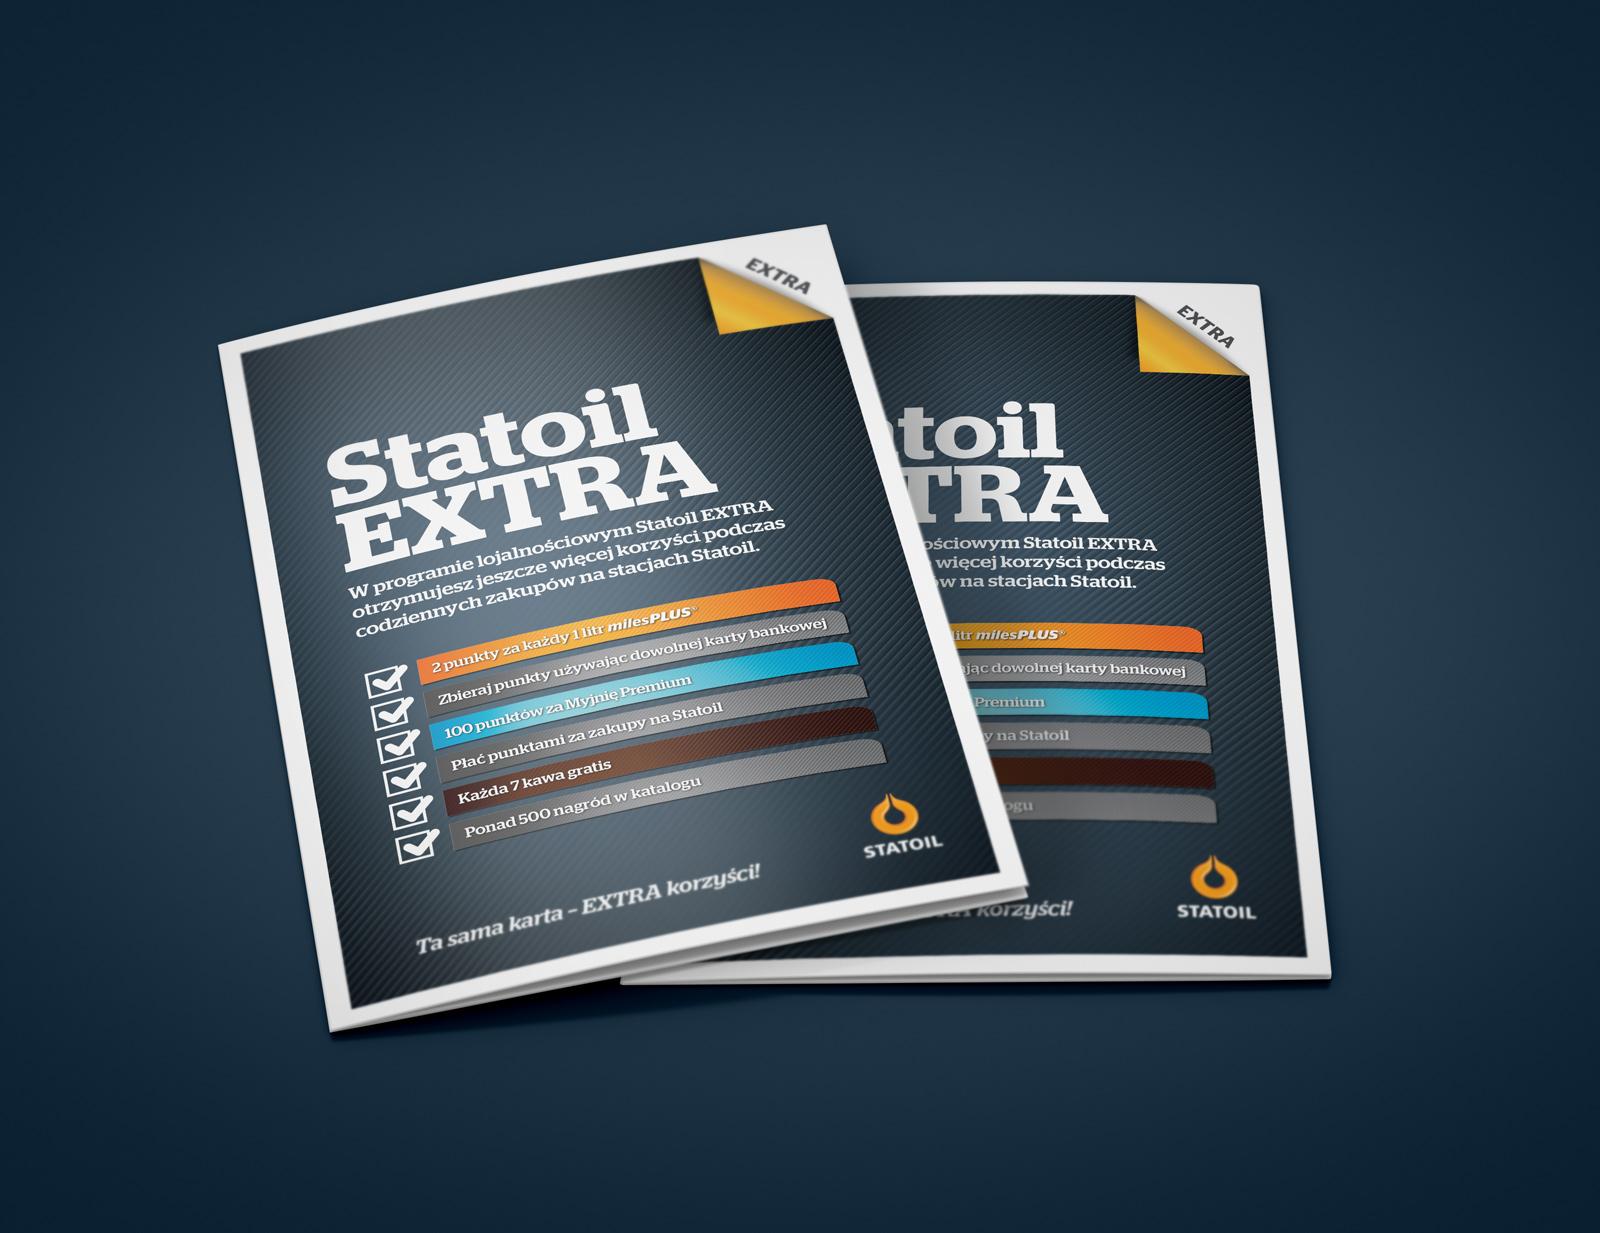 Ulotka 'Statoil Extra' - Statoil